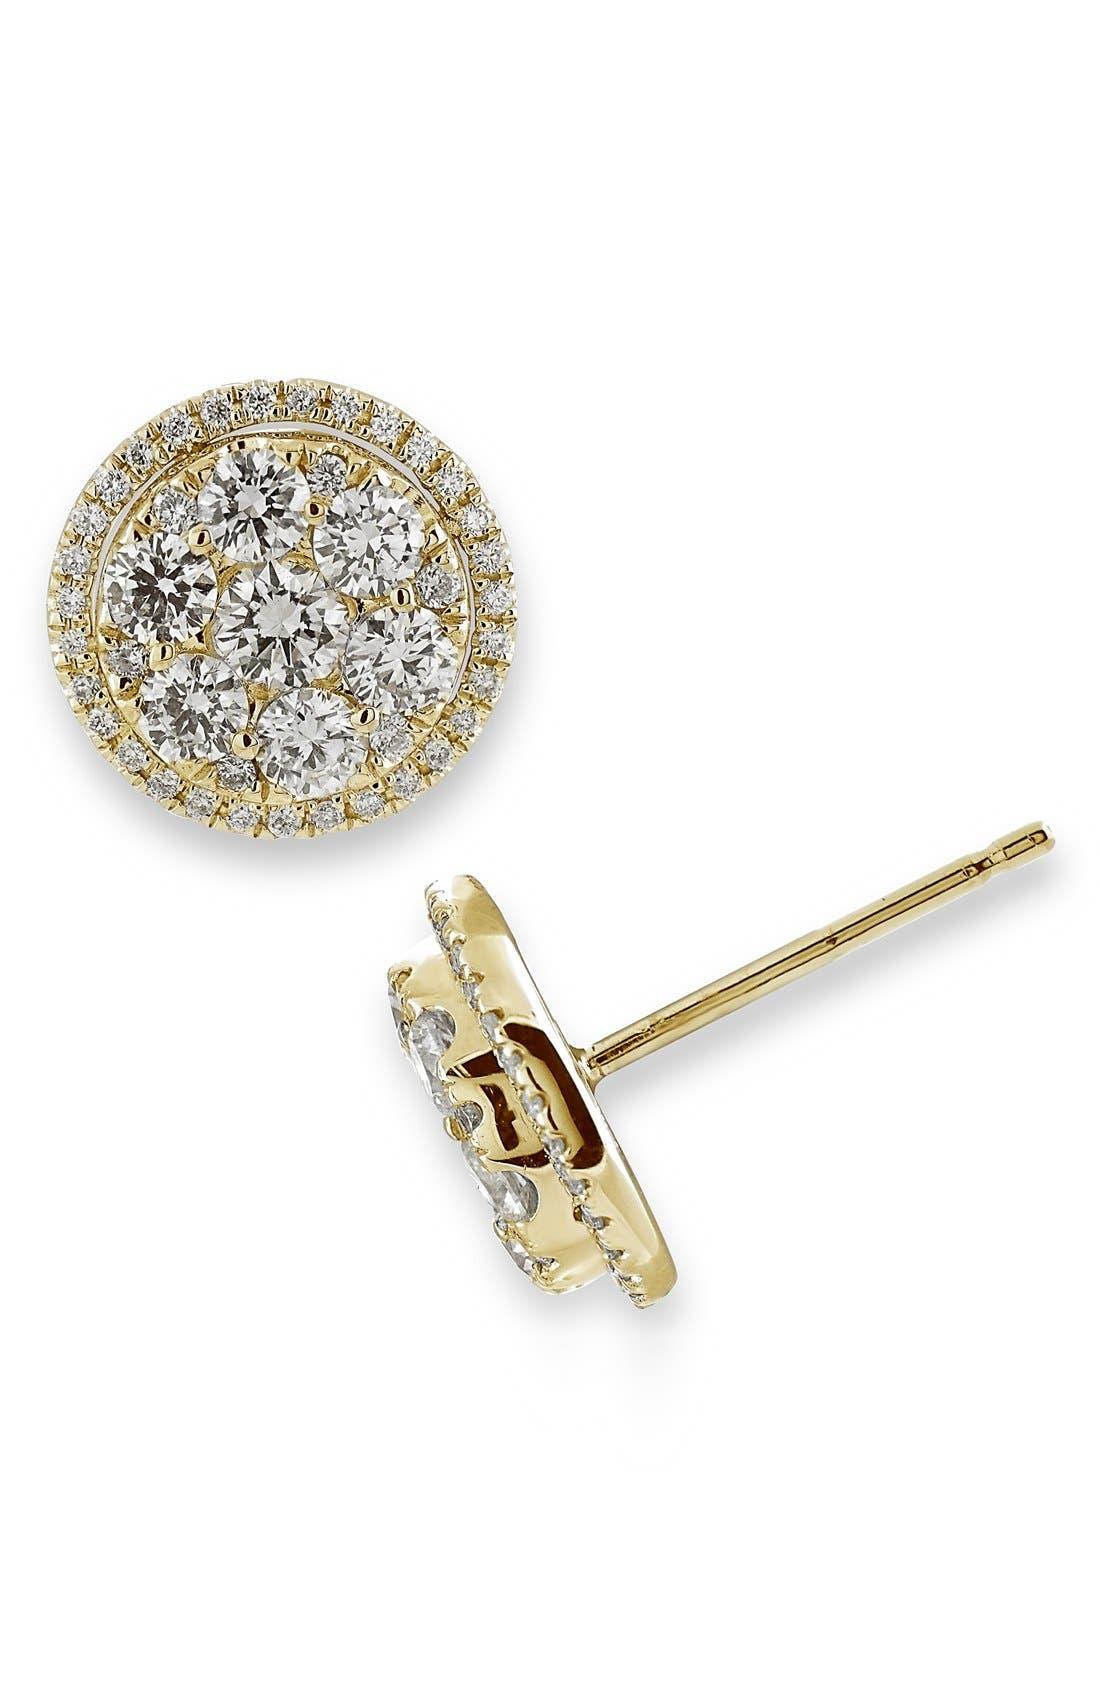 Main Image - Bony Levy 'Mika' Round Halo Diamond Stud Earrings (Nordstrom Exclusive)